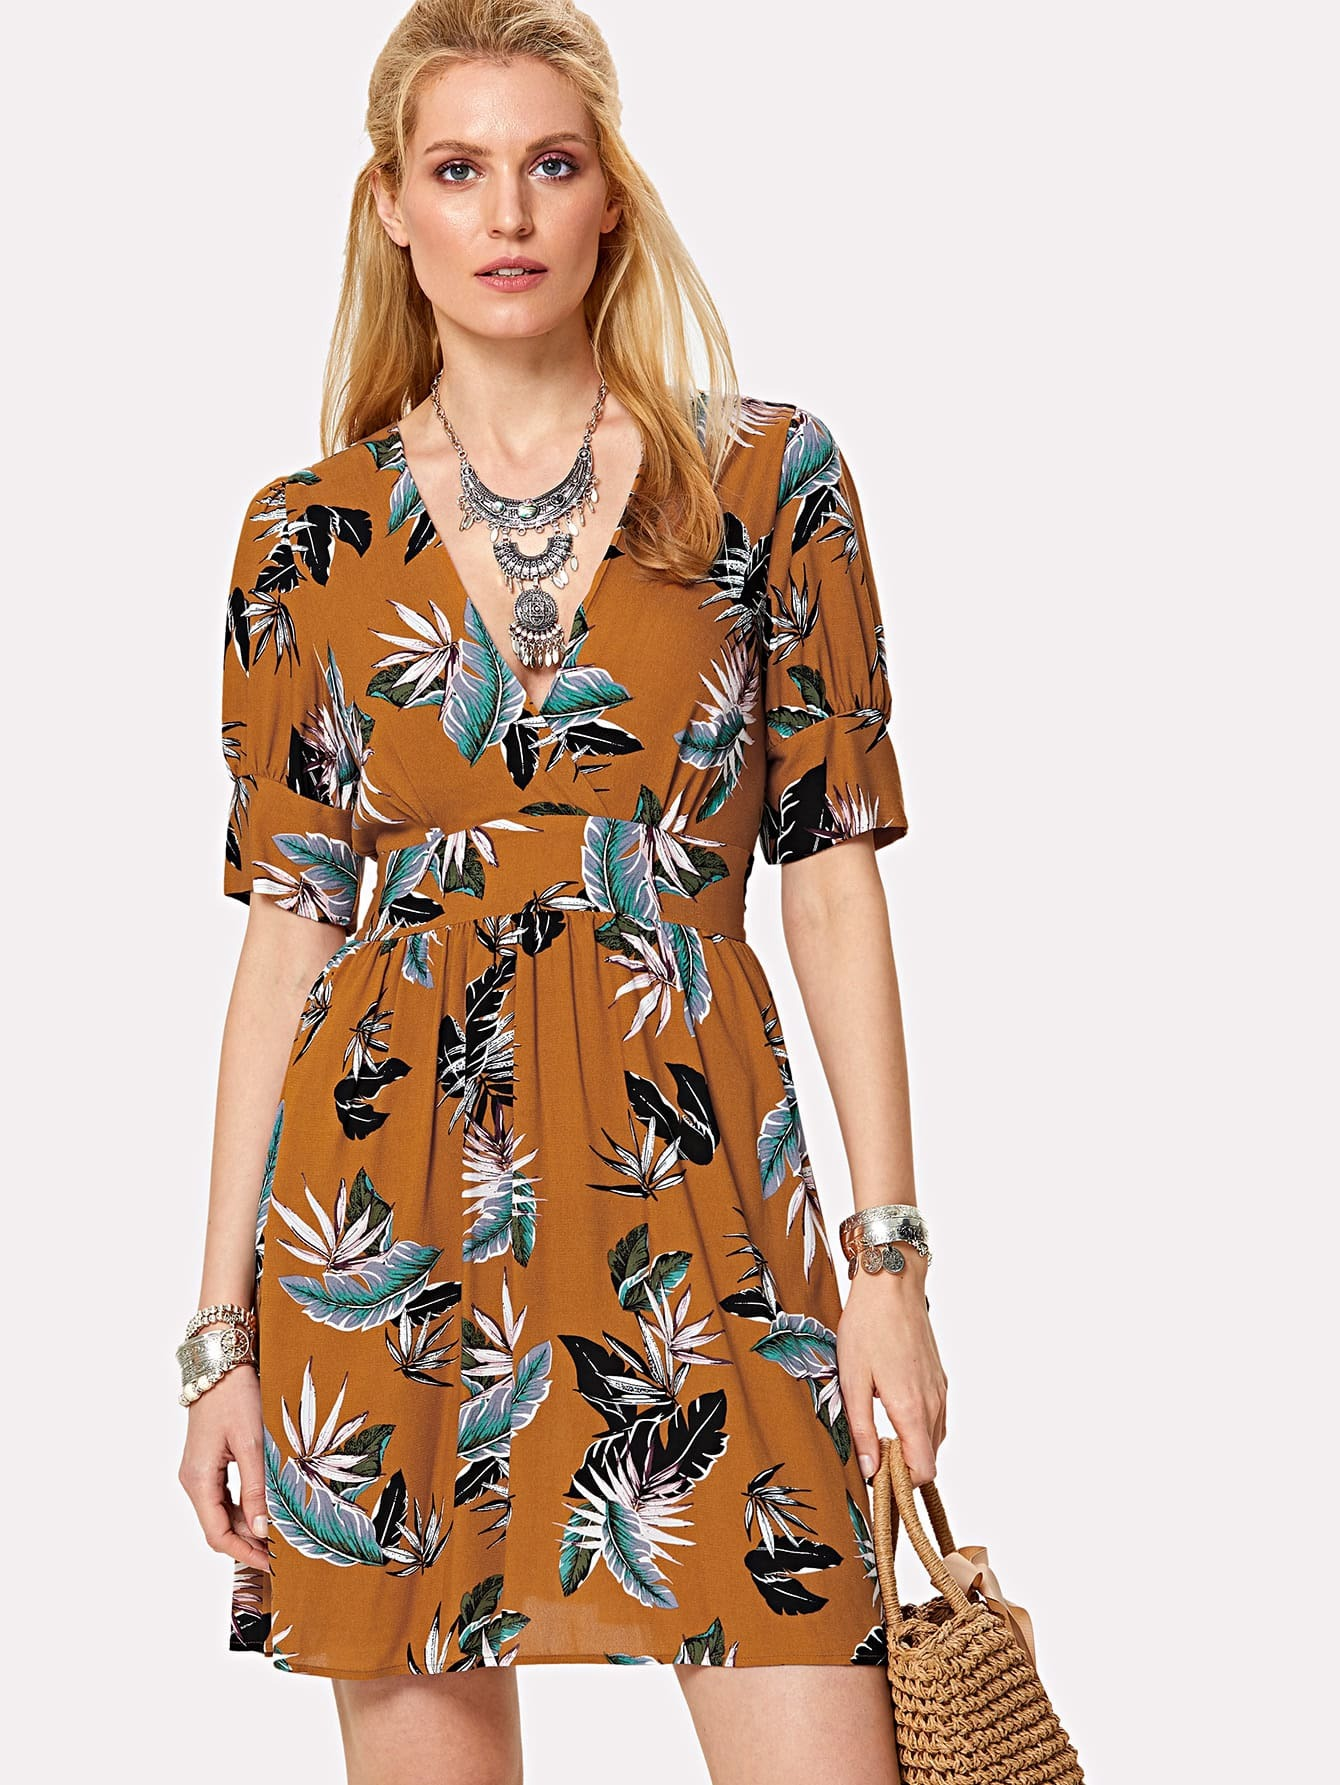 Double V Neck Wide Waistband Tropical Dress tops dress girls dresses girl clothes autumn style fashion cowboy vest 2017 new 2 pieces set